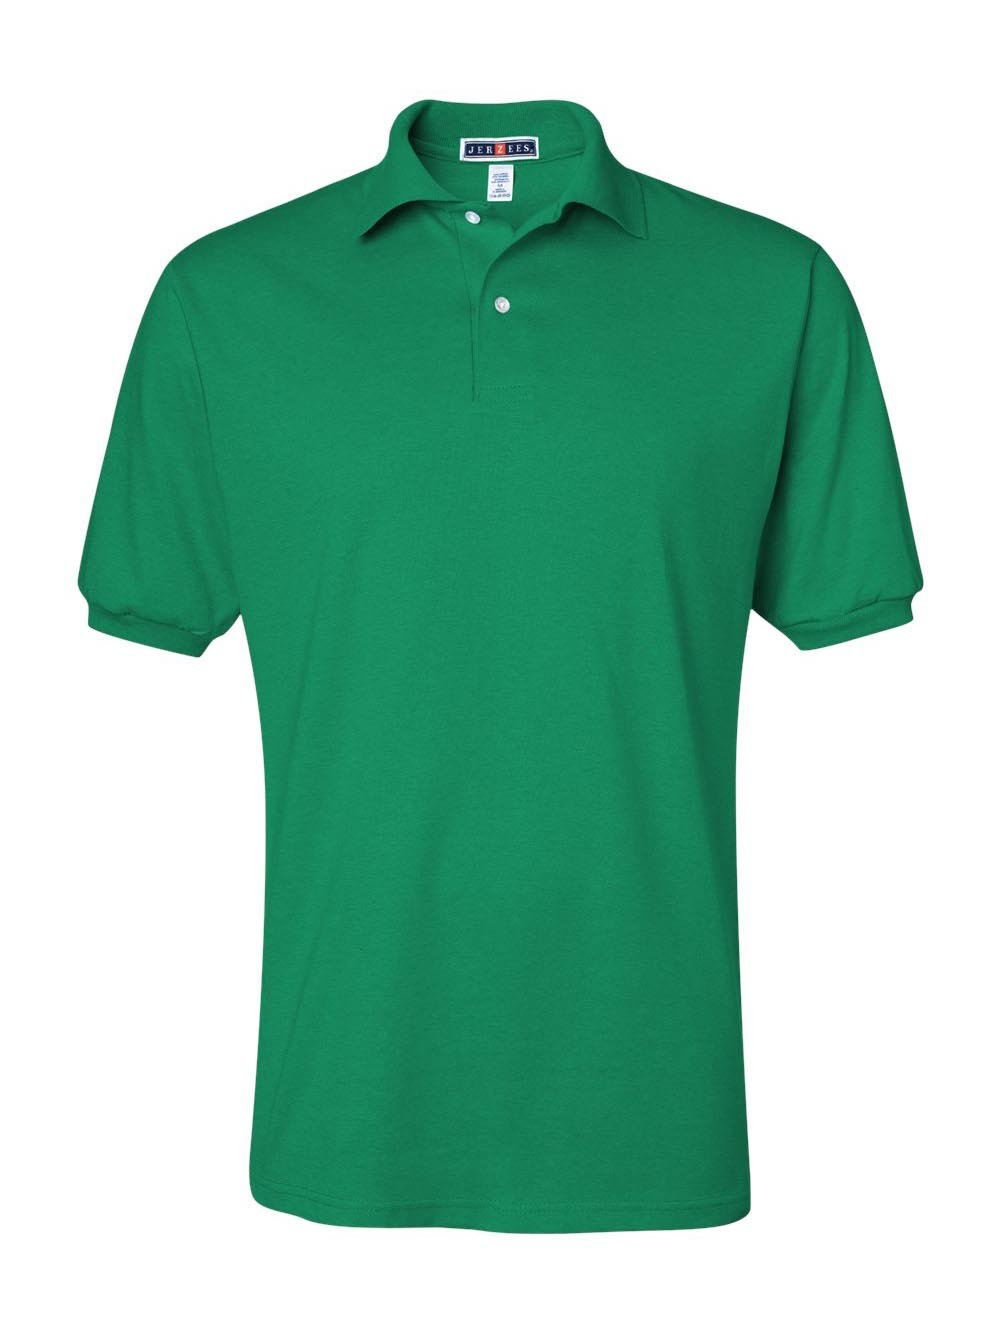 Jerzees Men's Spot Shield Short Sleeve Polo Sport Shirt, Kelly, 2X-Large